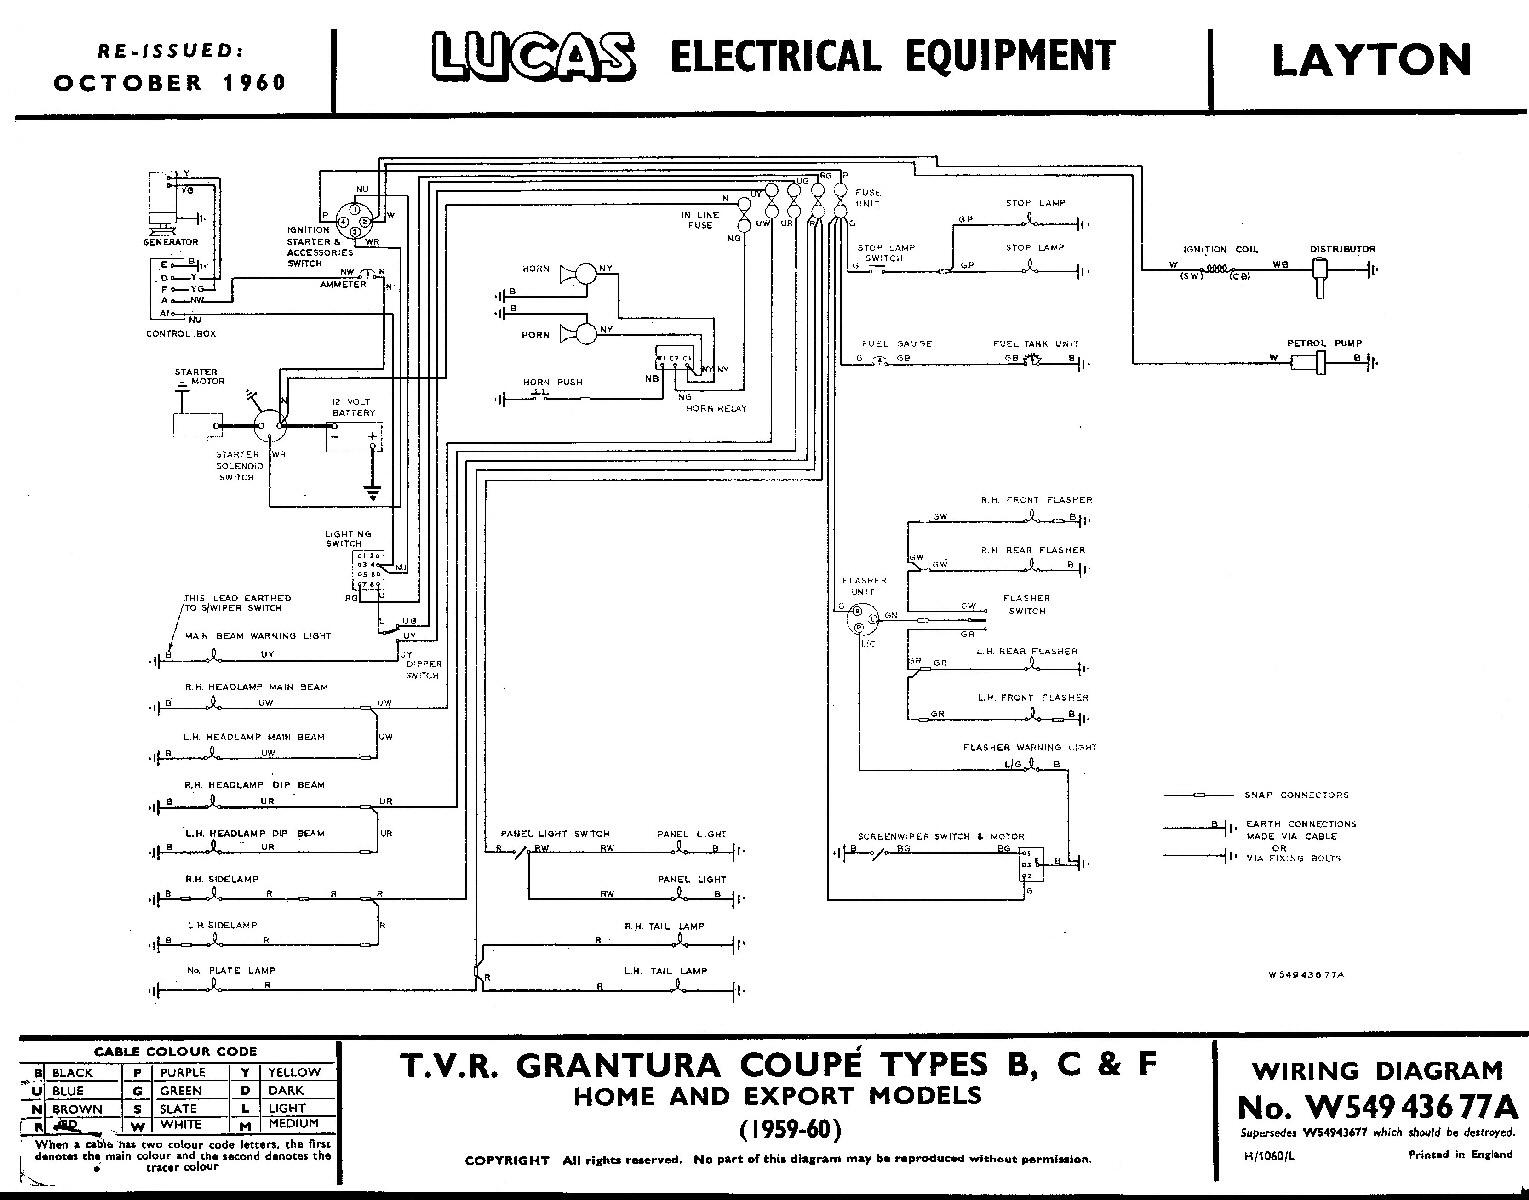 horton c2150 wiring diagram 3 way switch power into light sliding door parts